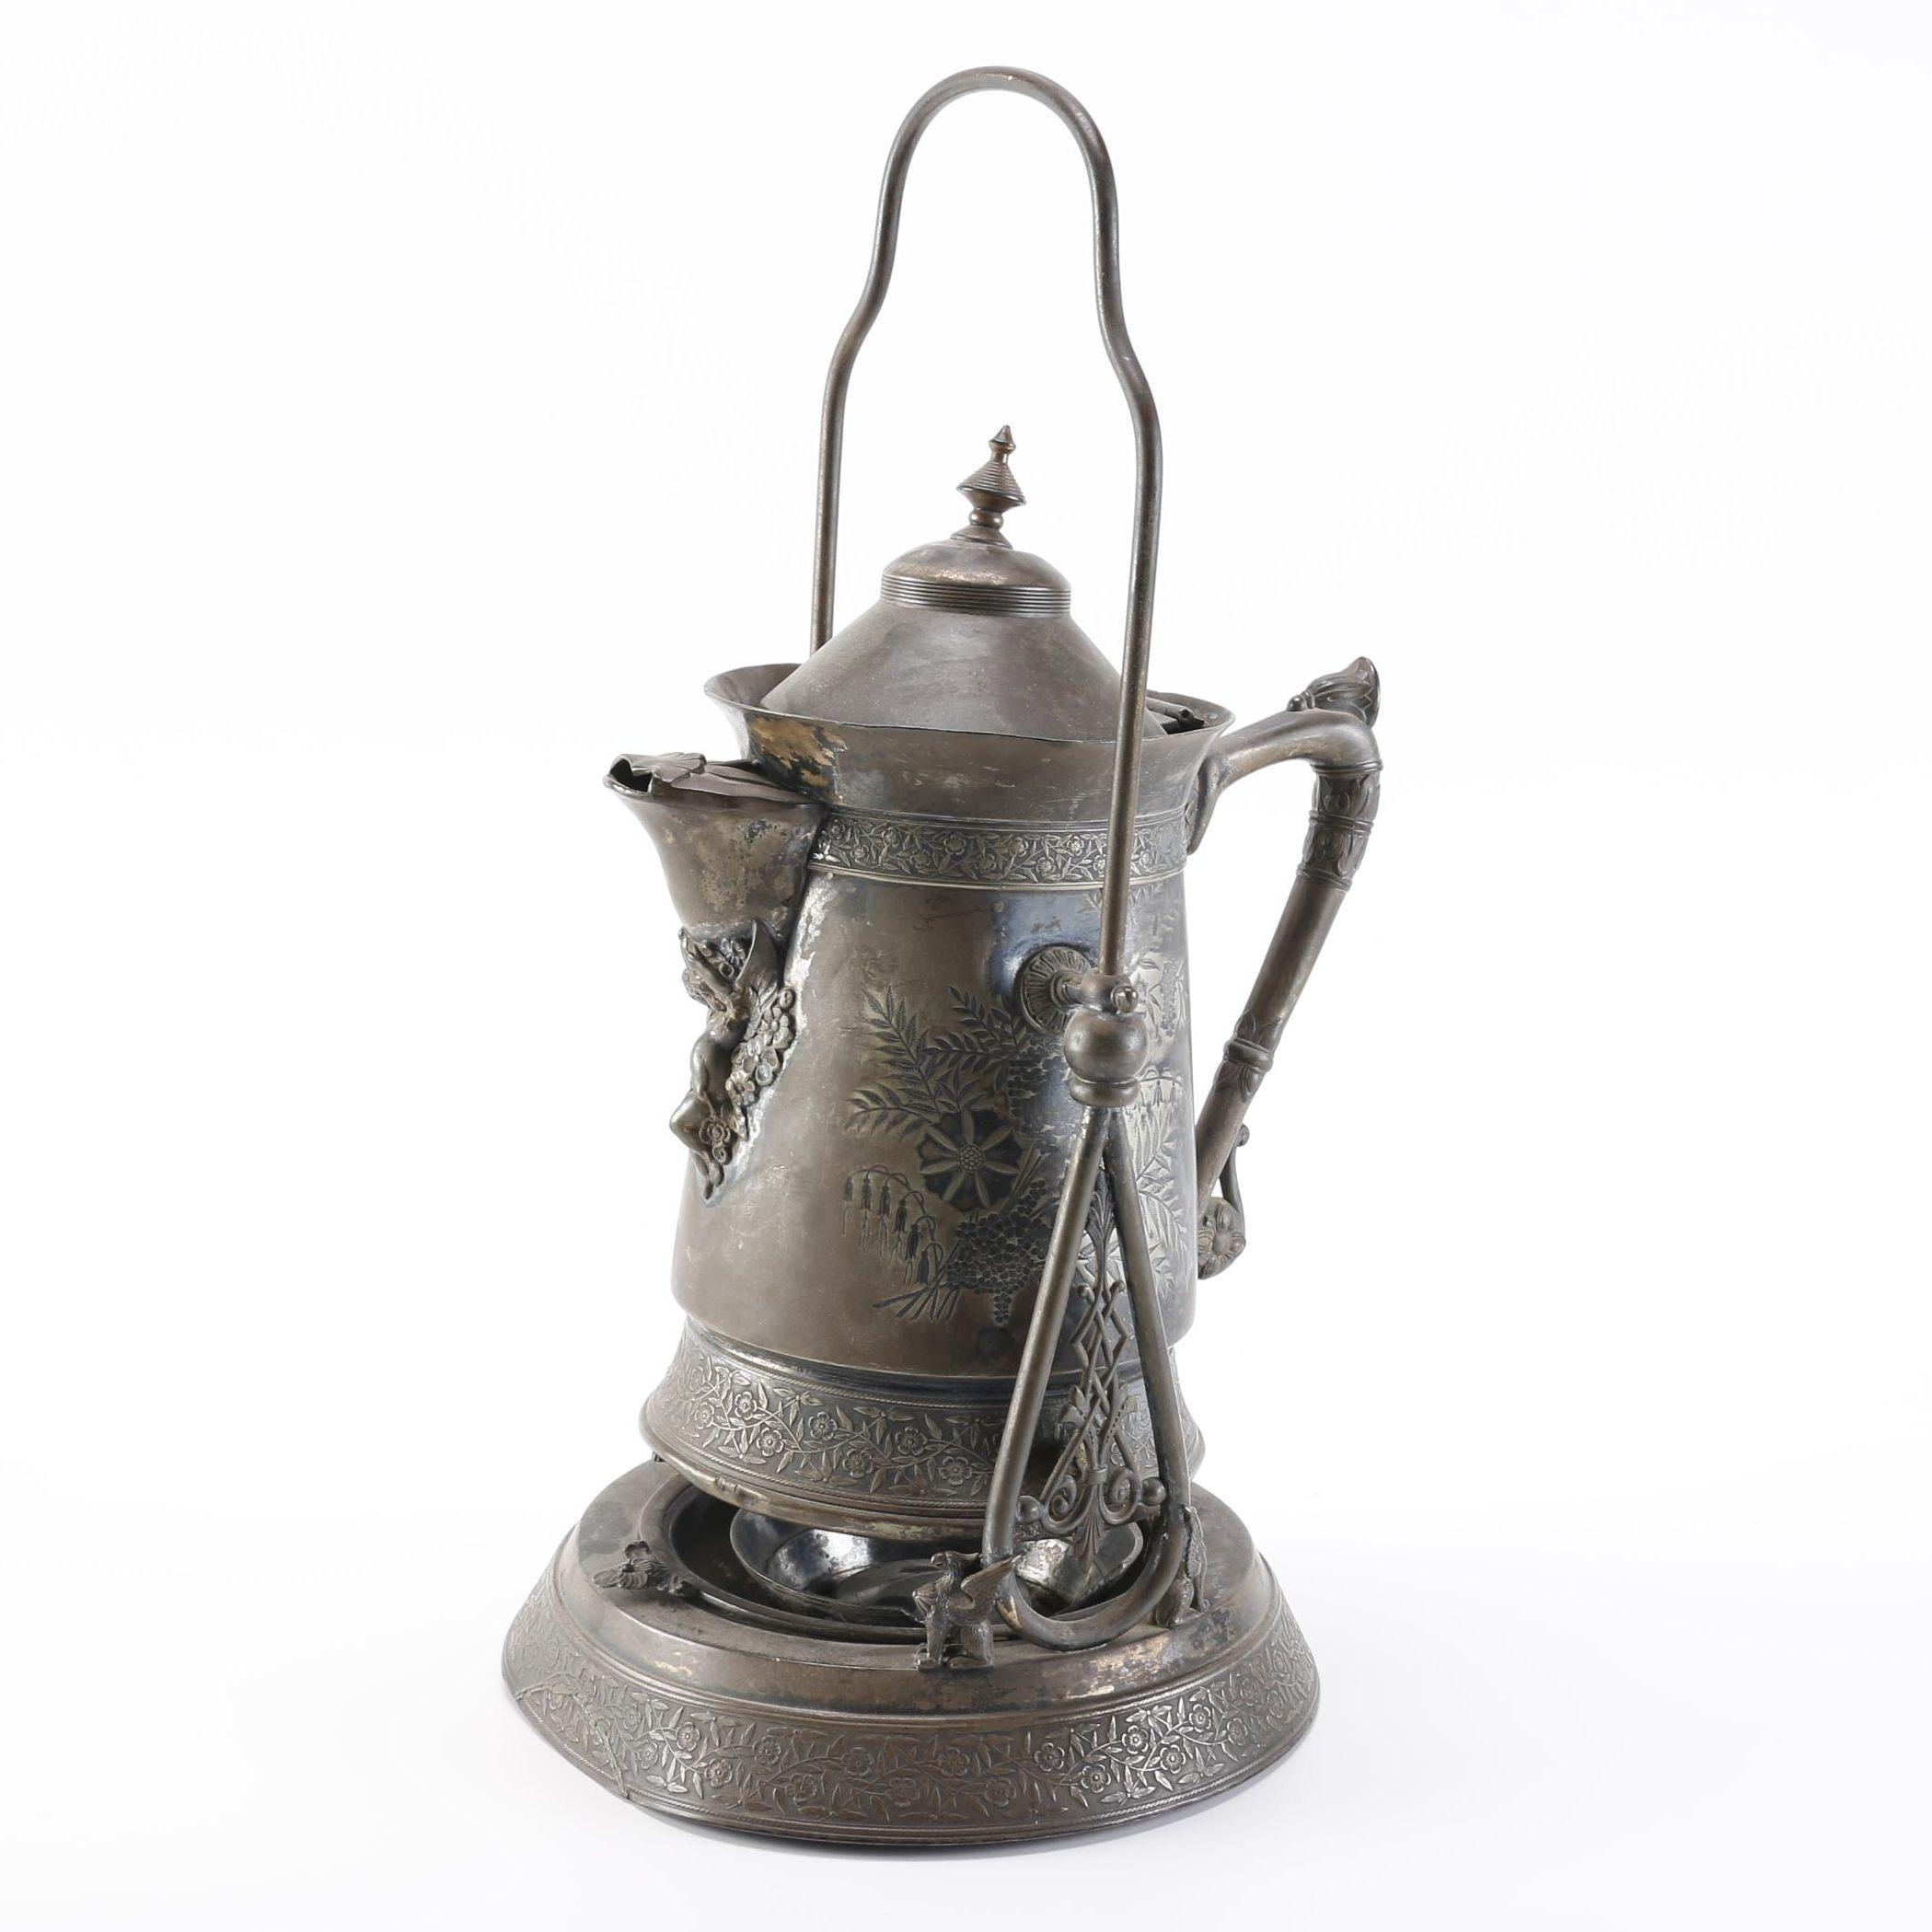 Meriden Silver Plate Tilting Coffee Pot